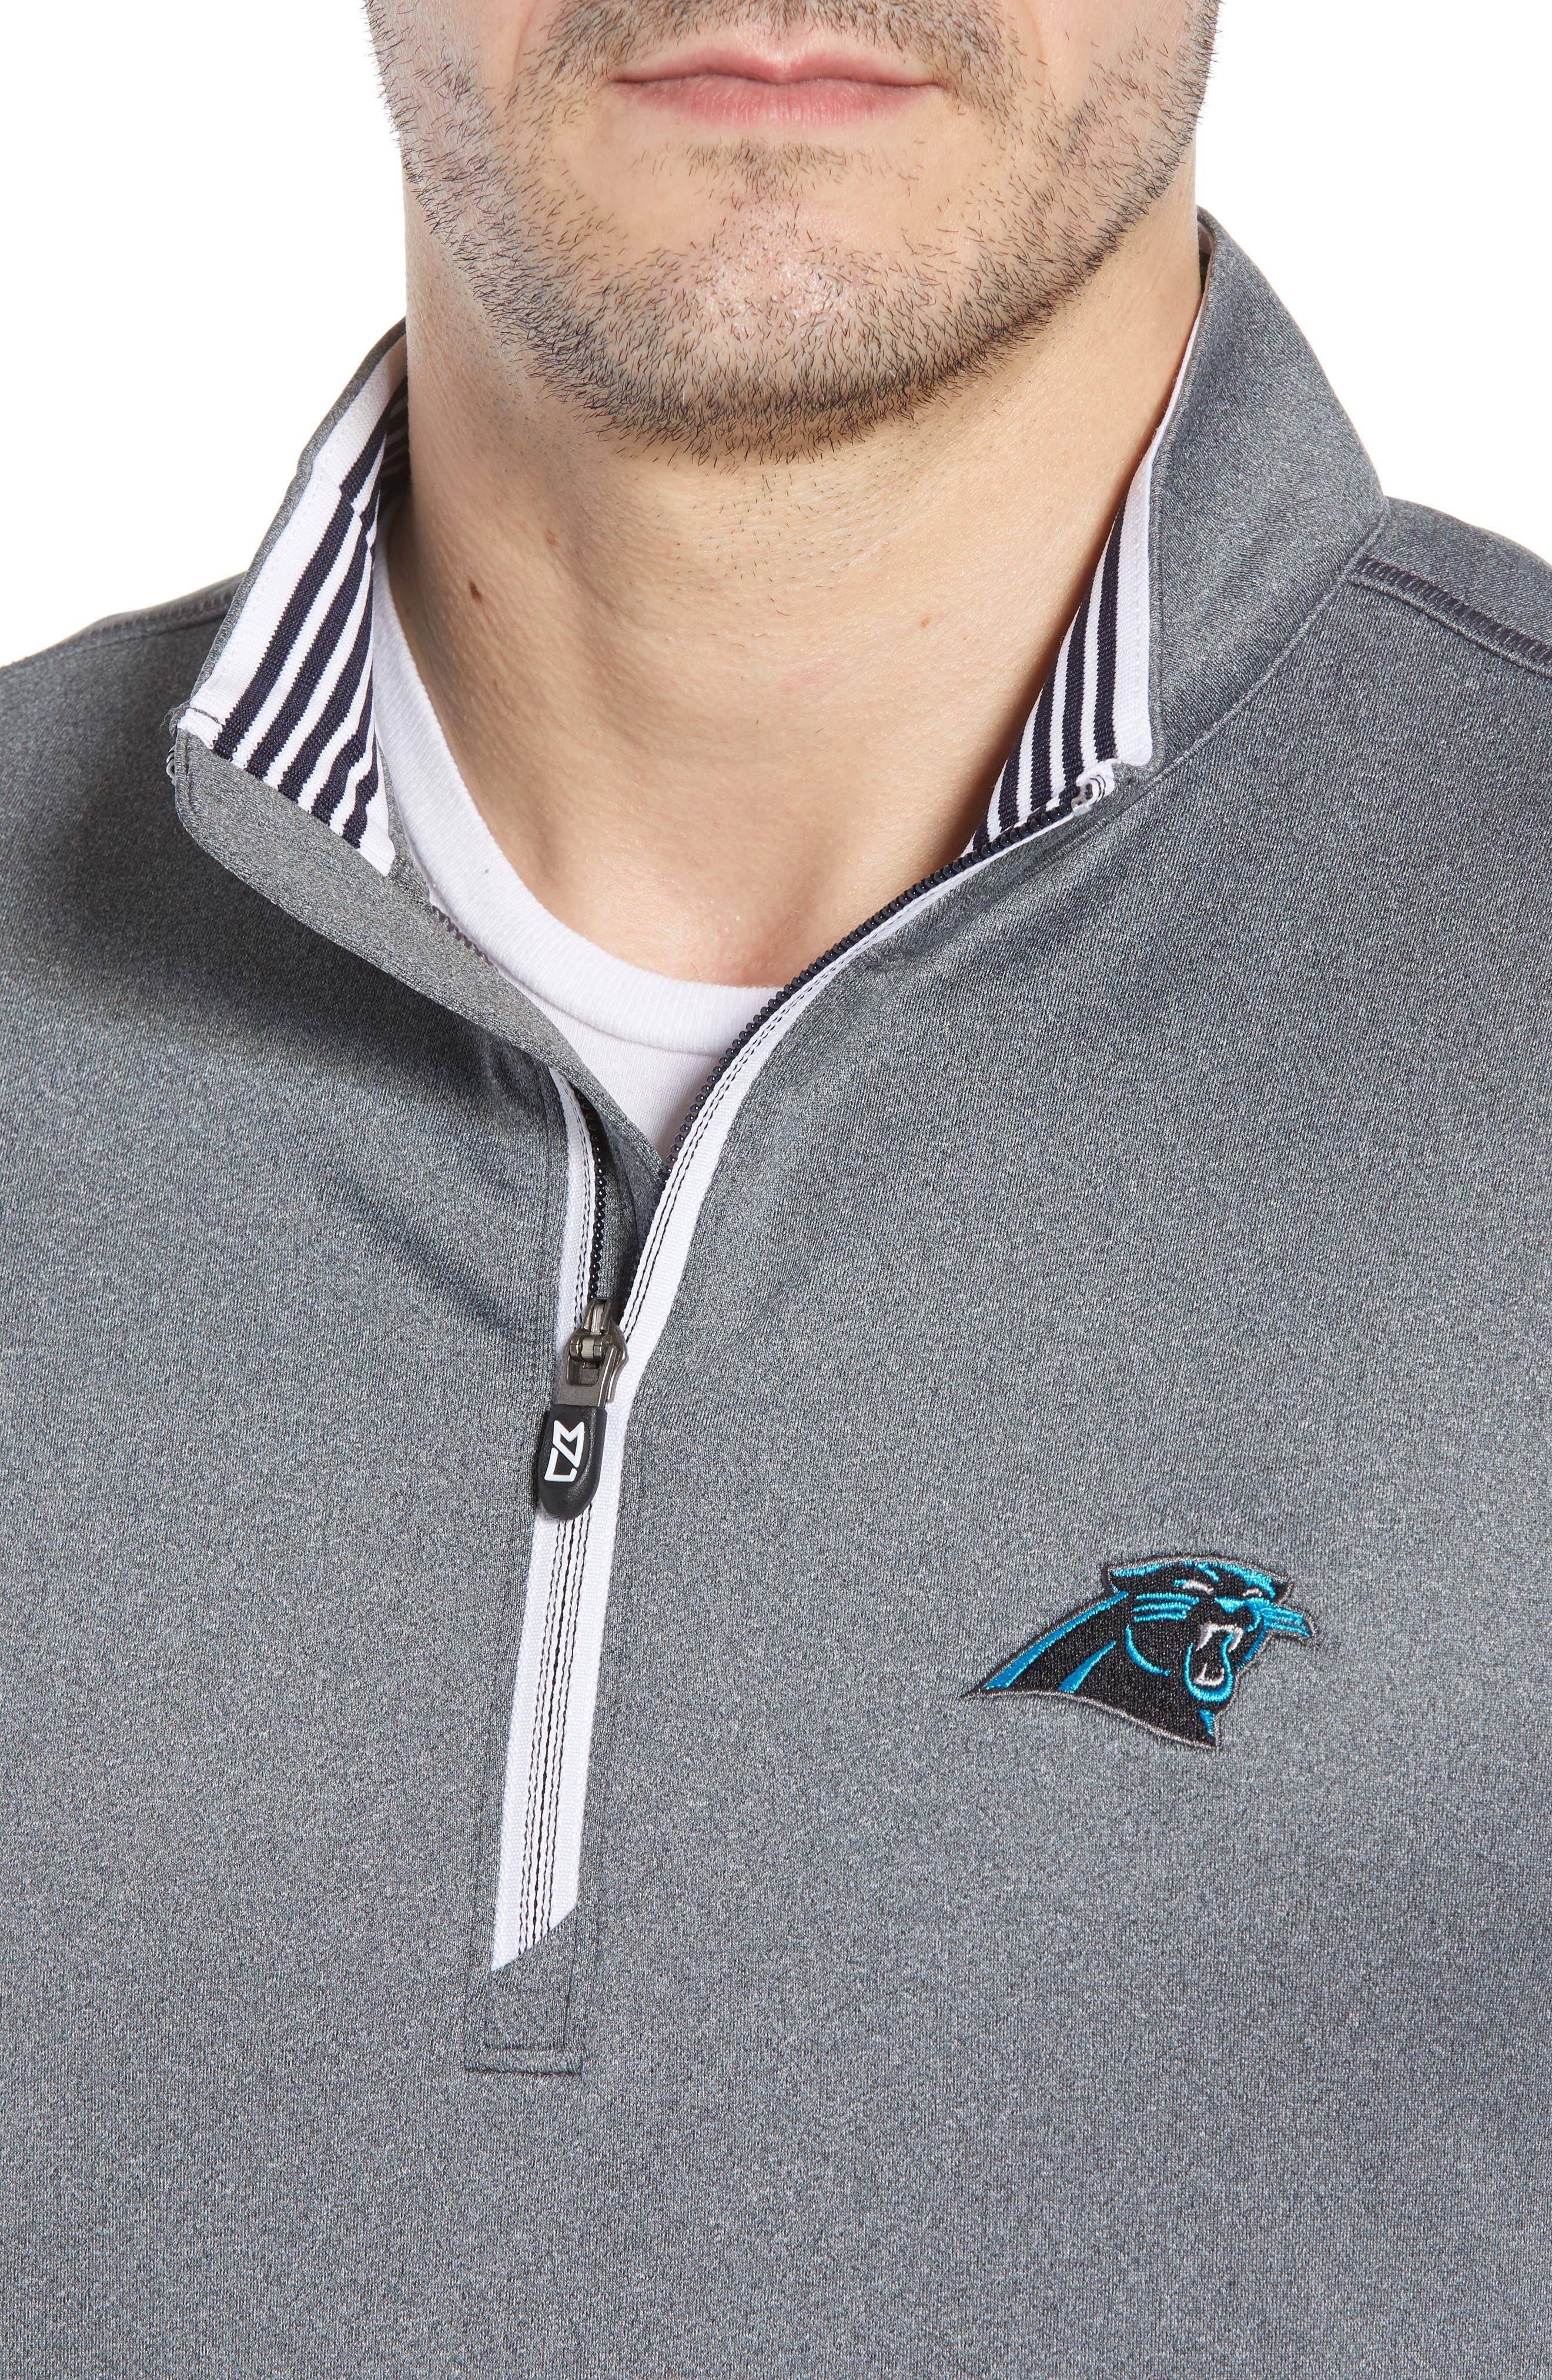 Endurance Carolina Panthers Regular Fit Pullover,                             Alternate thumbnail 4, color,                             CHARCOAL HEATHER